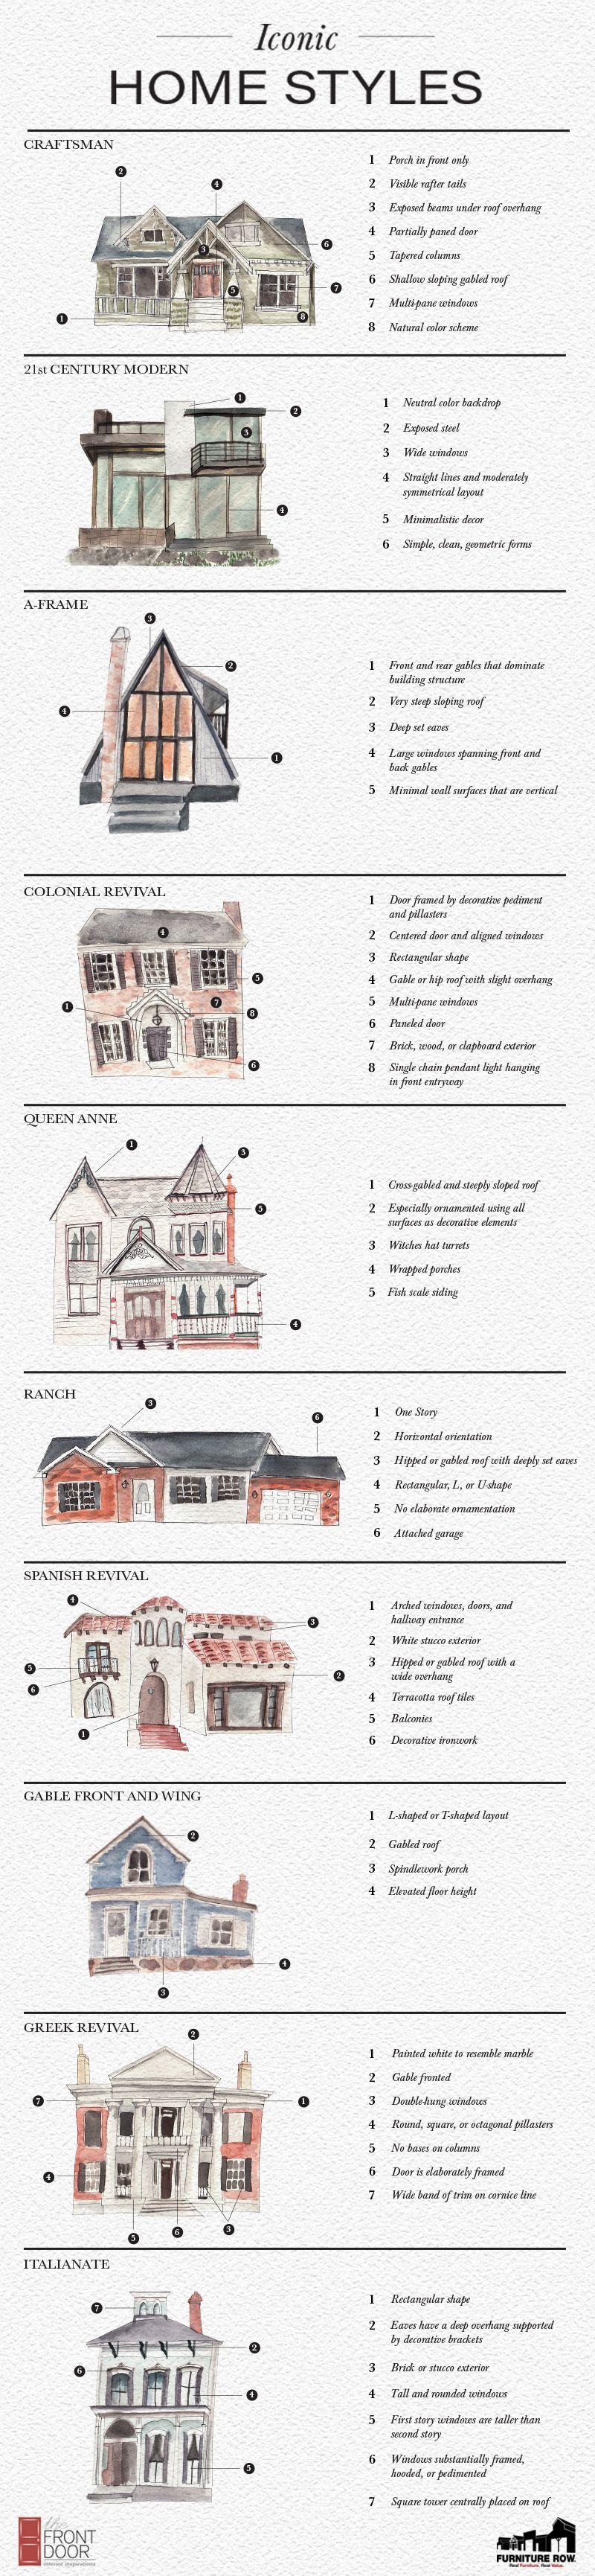 Home Architecture Styles Home Architecture Styles House